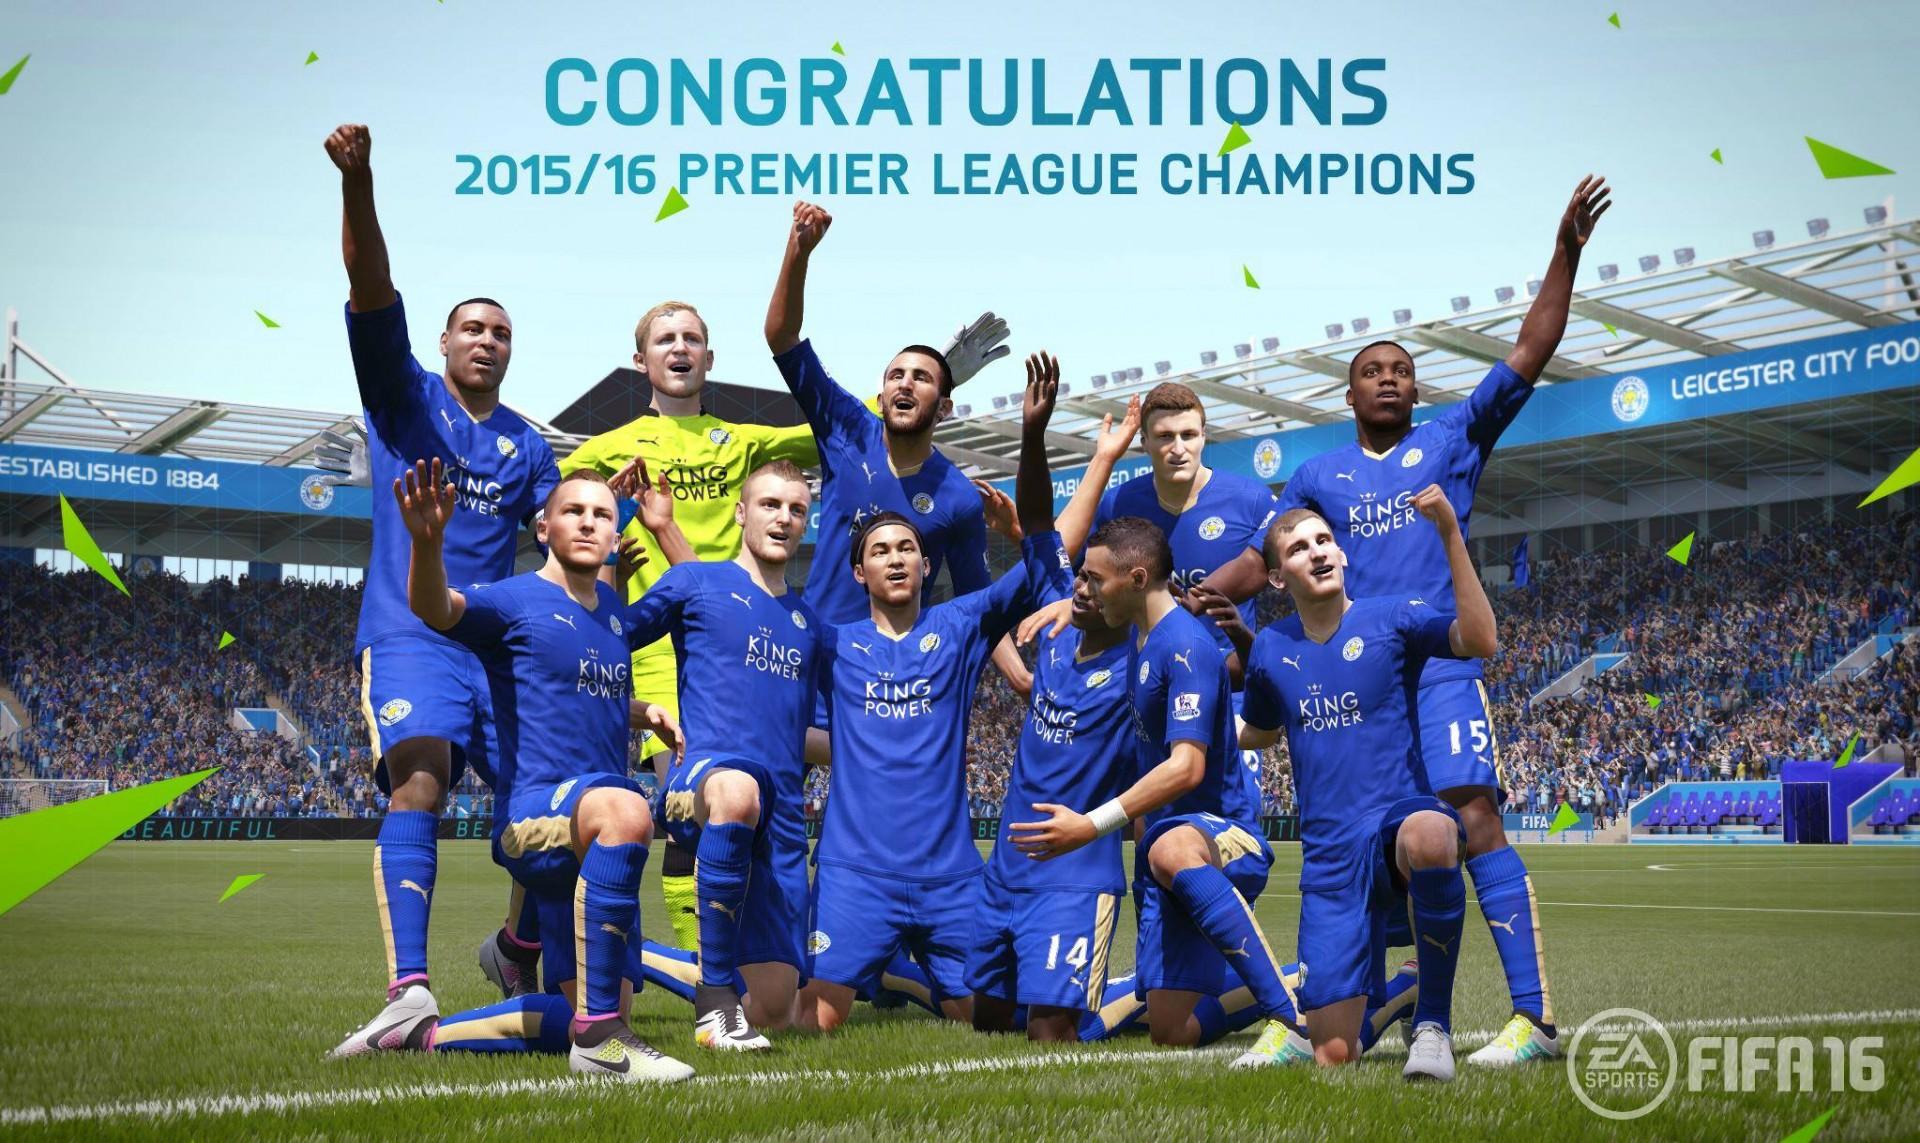 Leicester Fifa 16 campione di Inghilterra